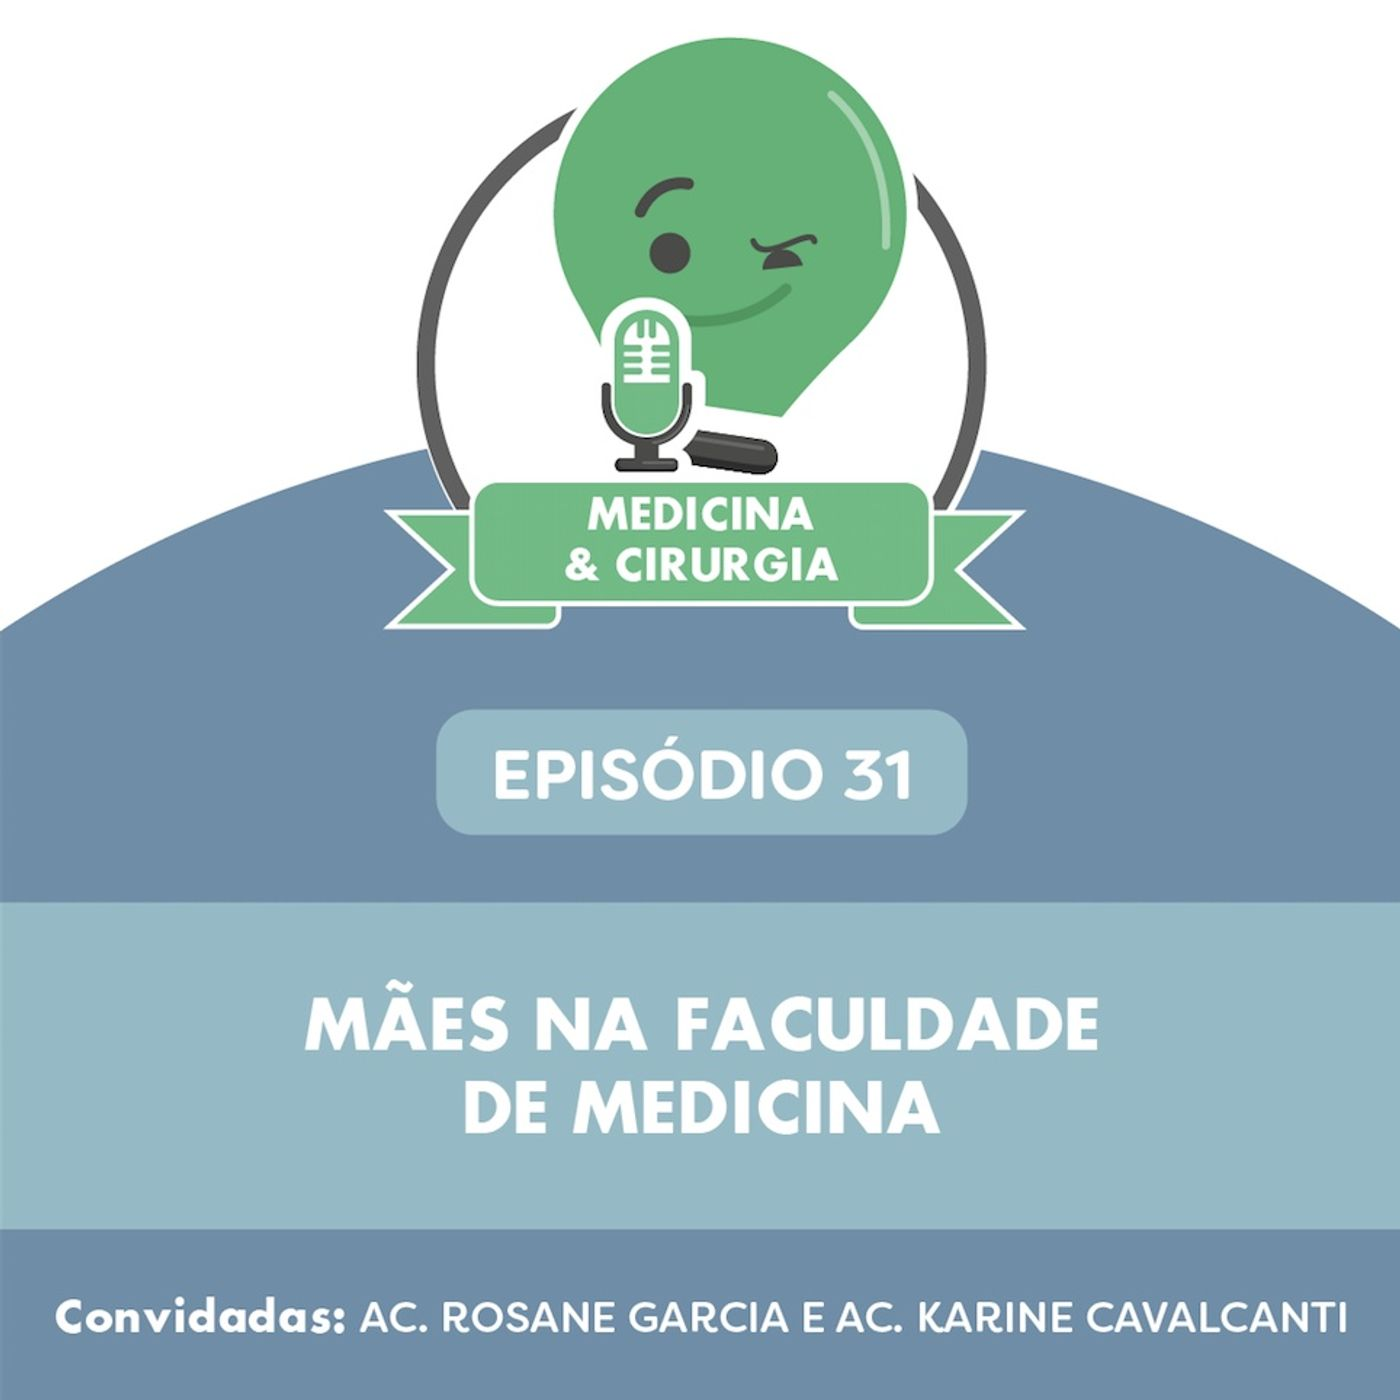 31 - Mães na faculdade de medicina